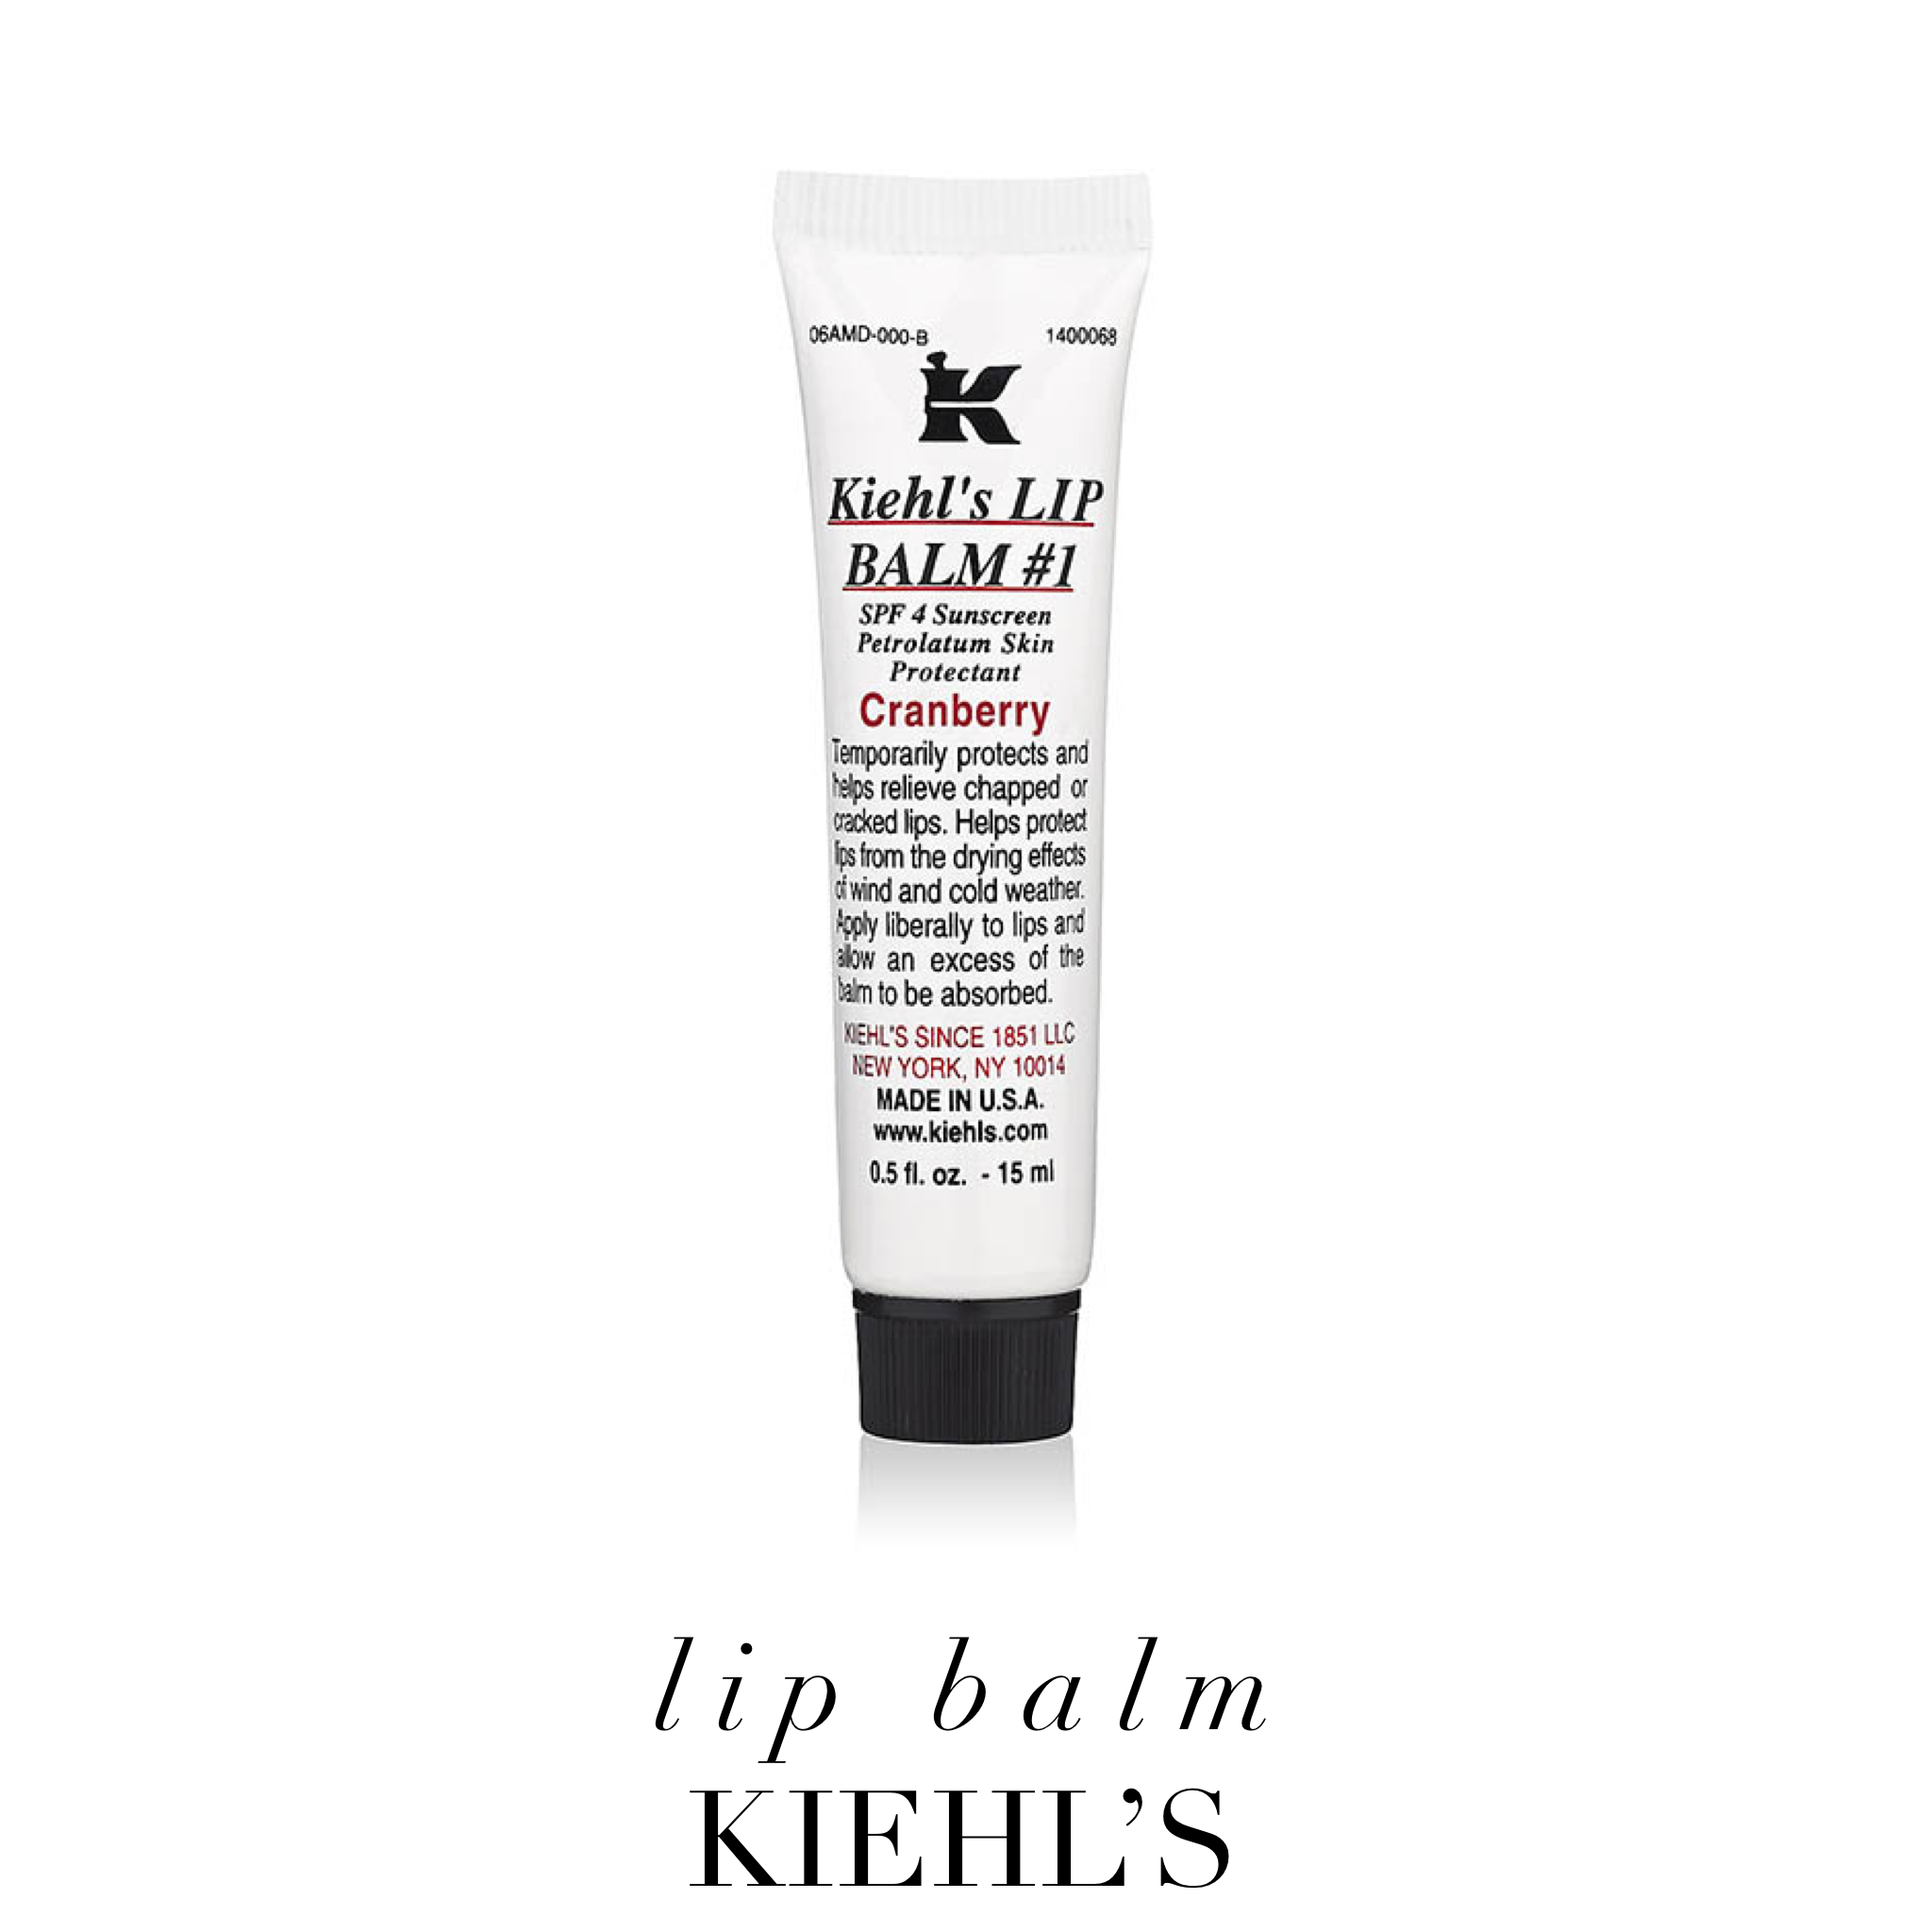 Lip balm by Kiehl's